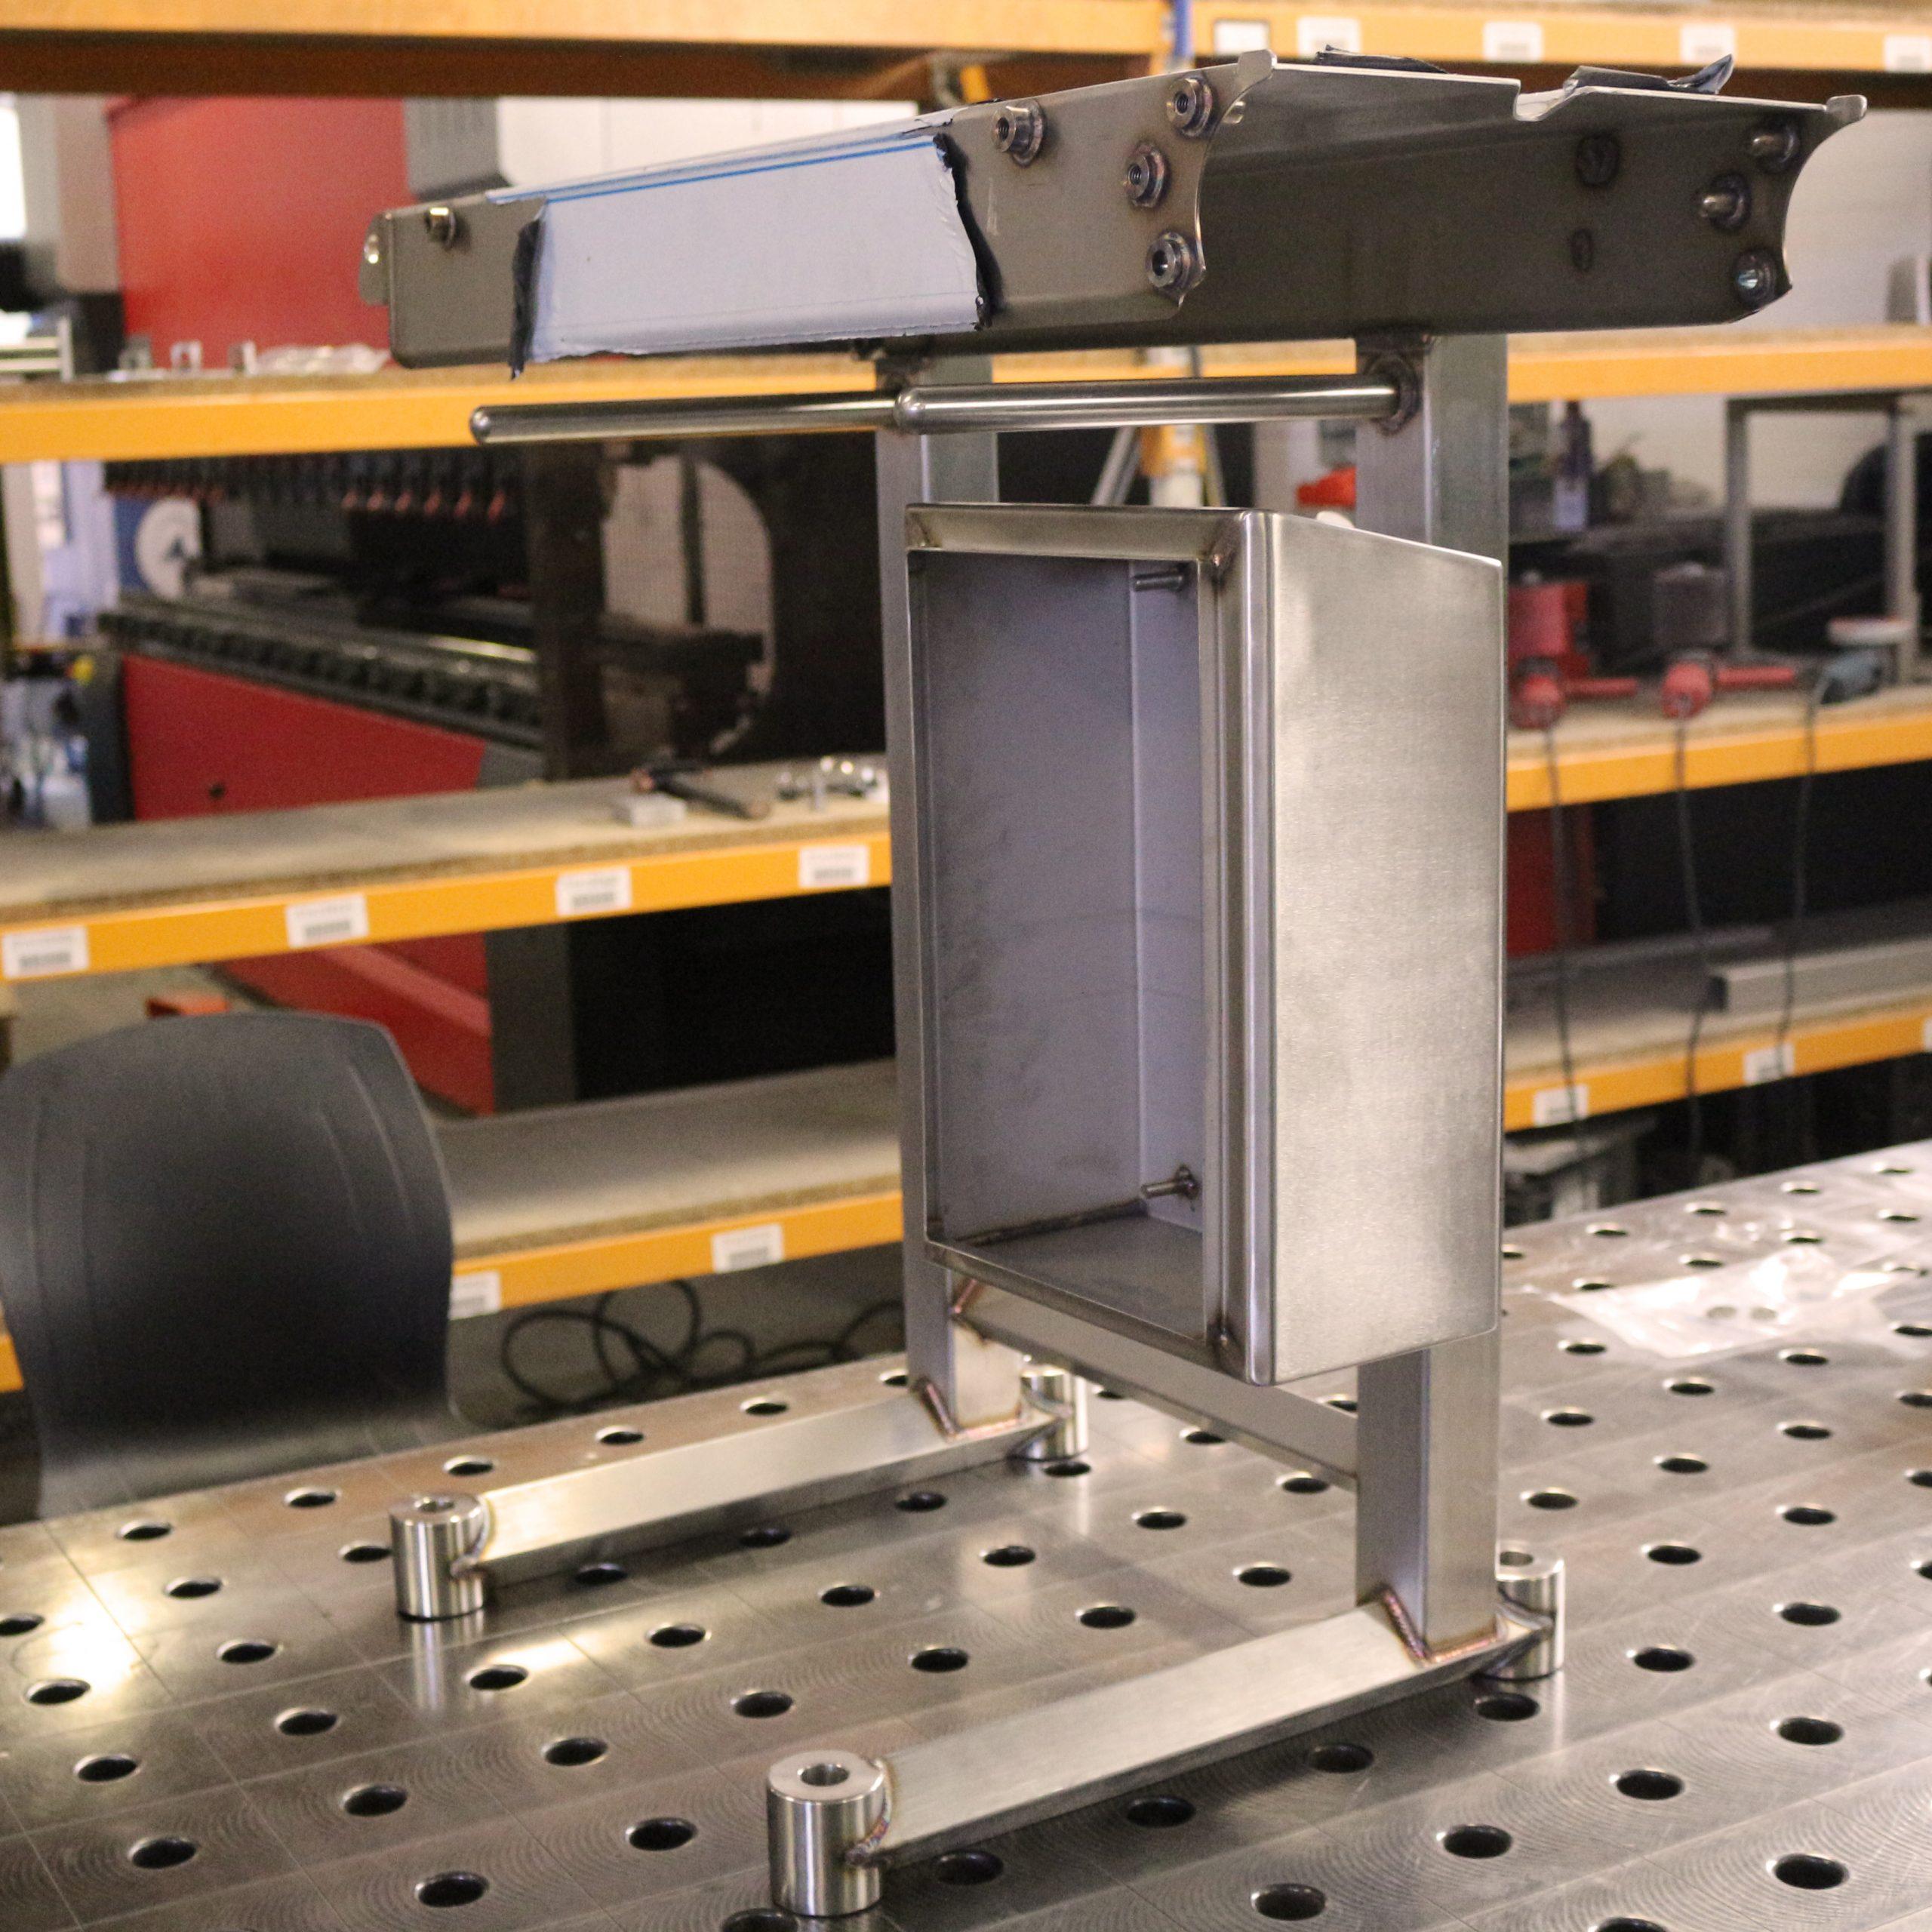 welded machine bed